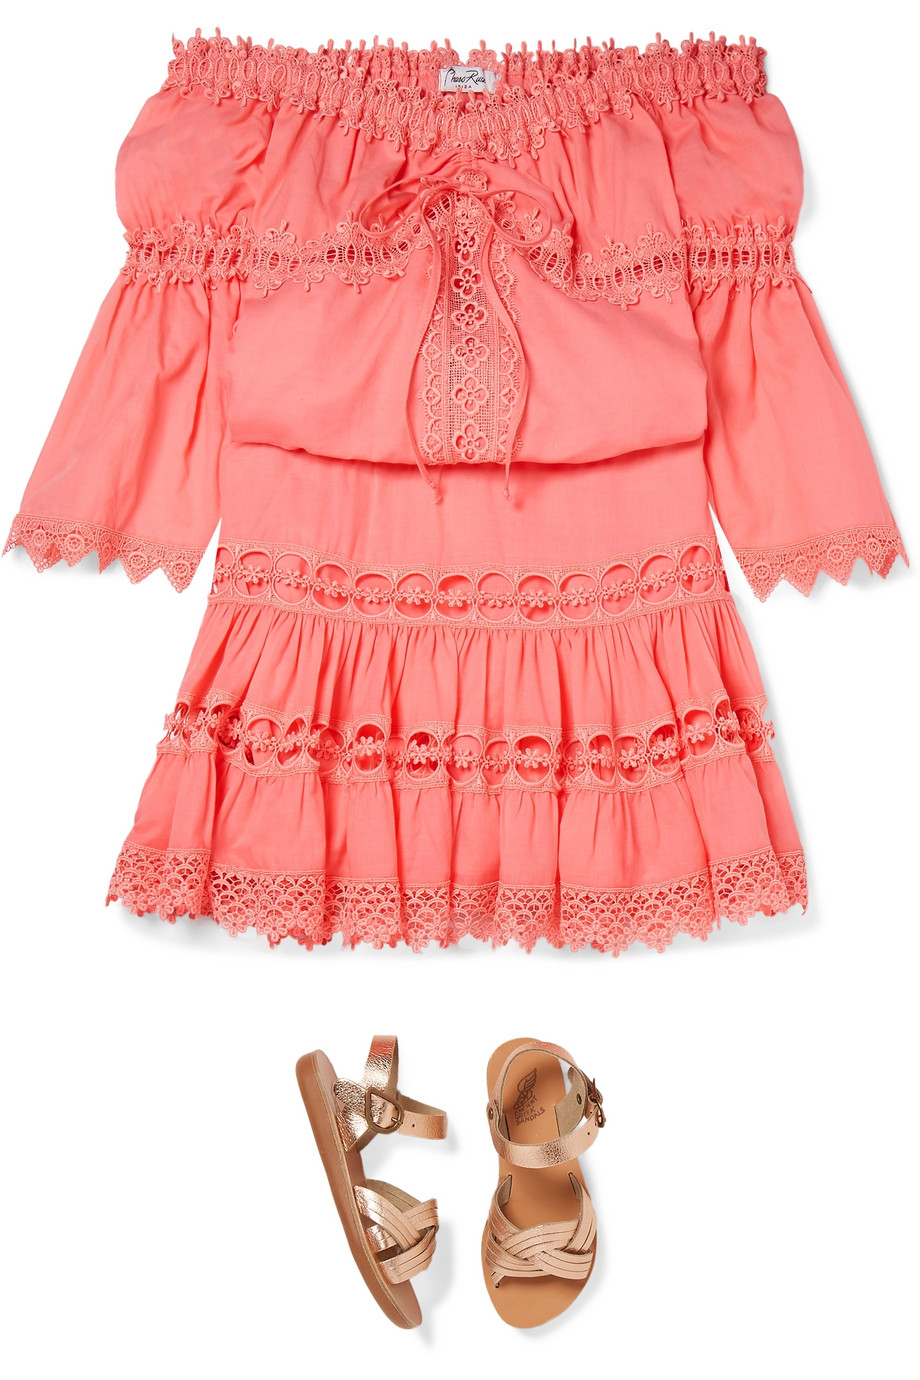 Charo Ruiz Kids Greta lace-trimmed cotton-blend skirt